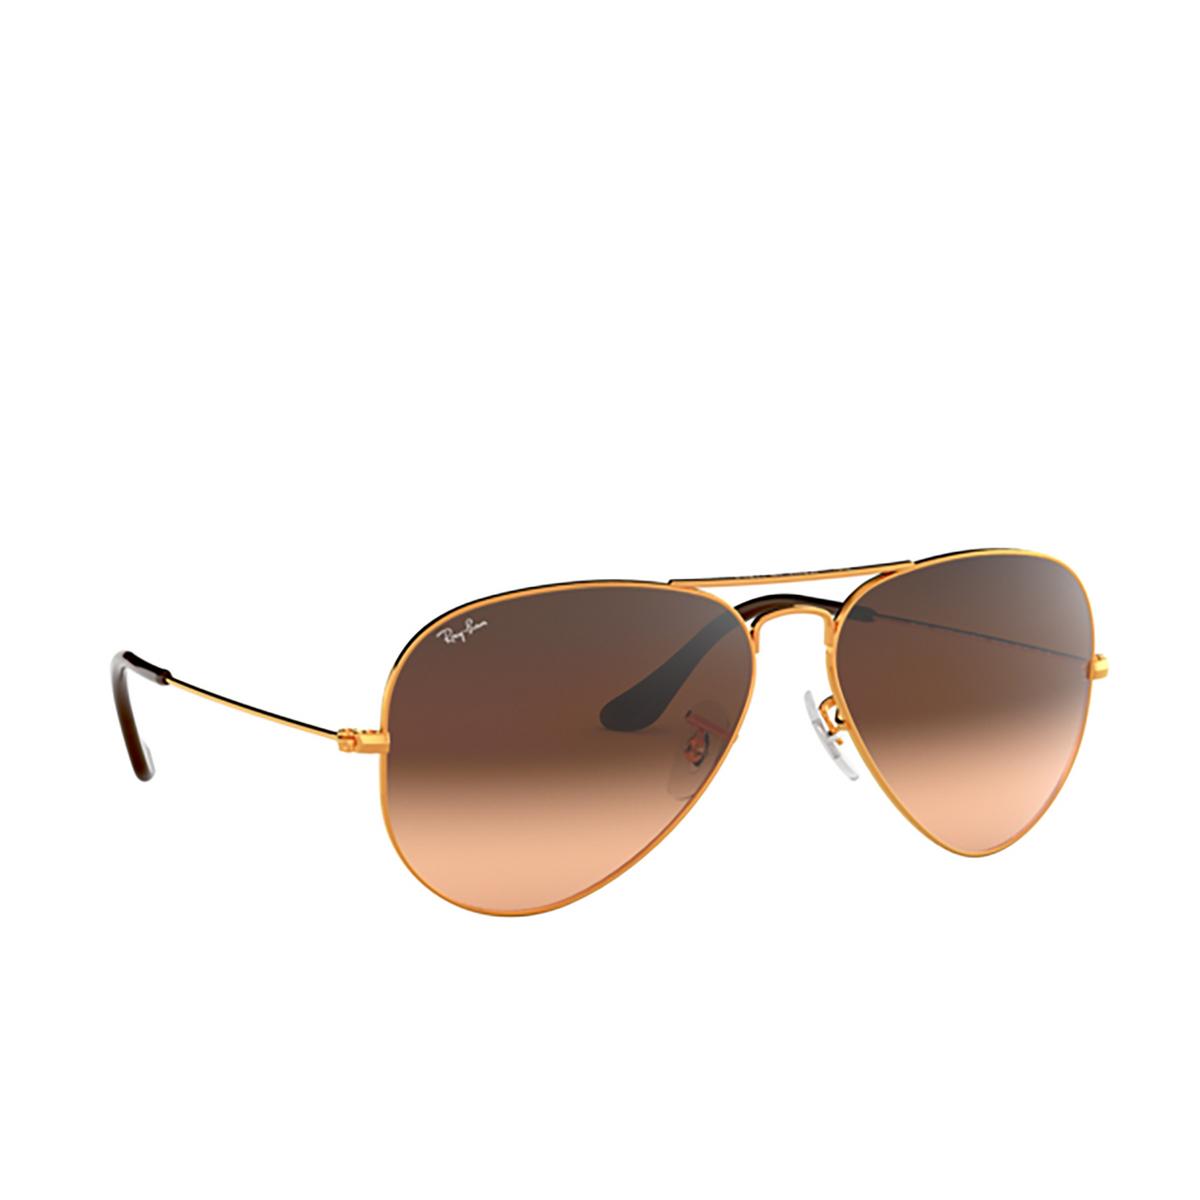 Ray-Ban® Aviator Sunglasses: Aviator Large Metal RB3025 color Light Bronze 9001A5 - three-quarters view.